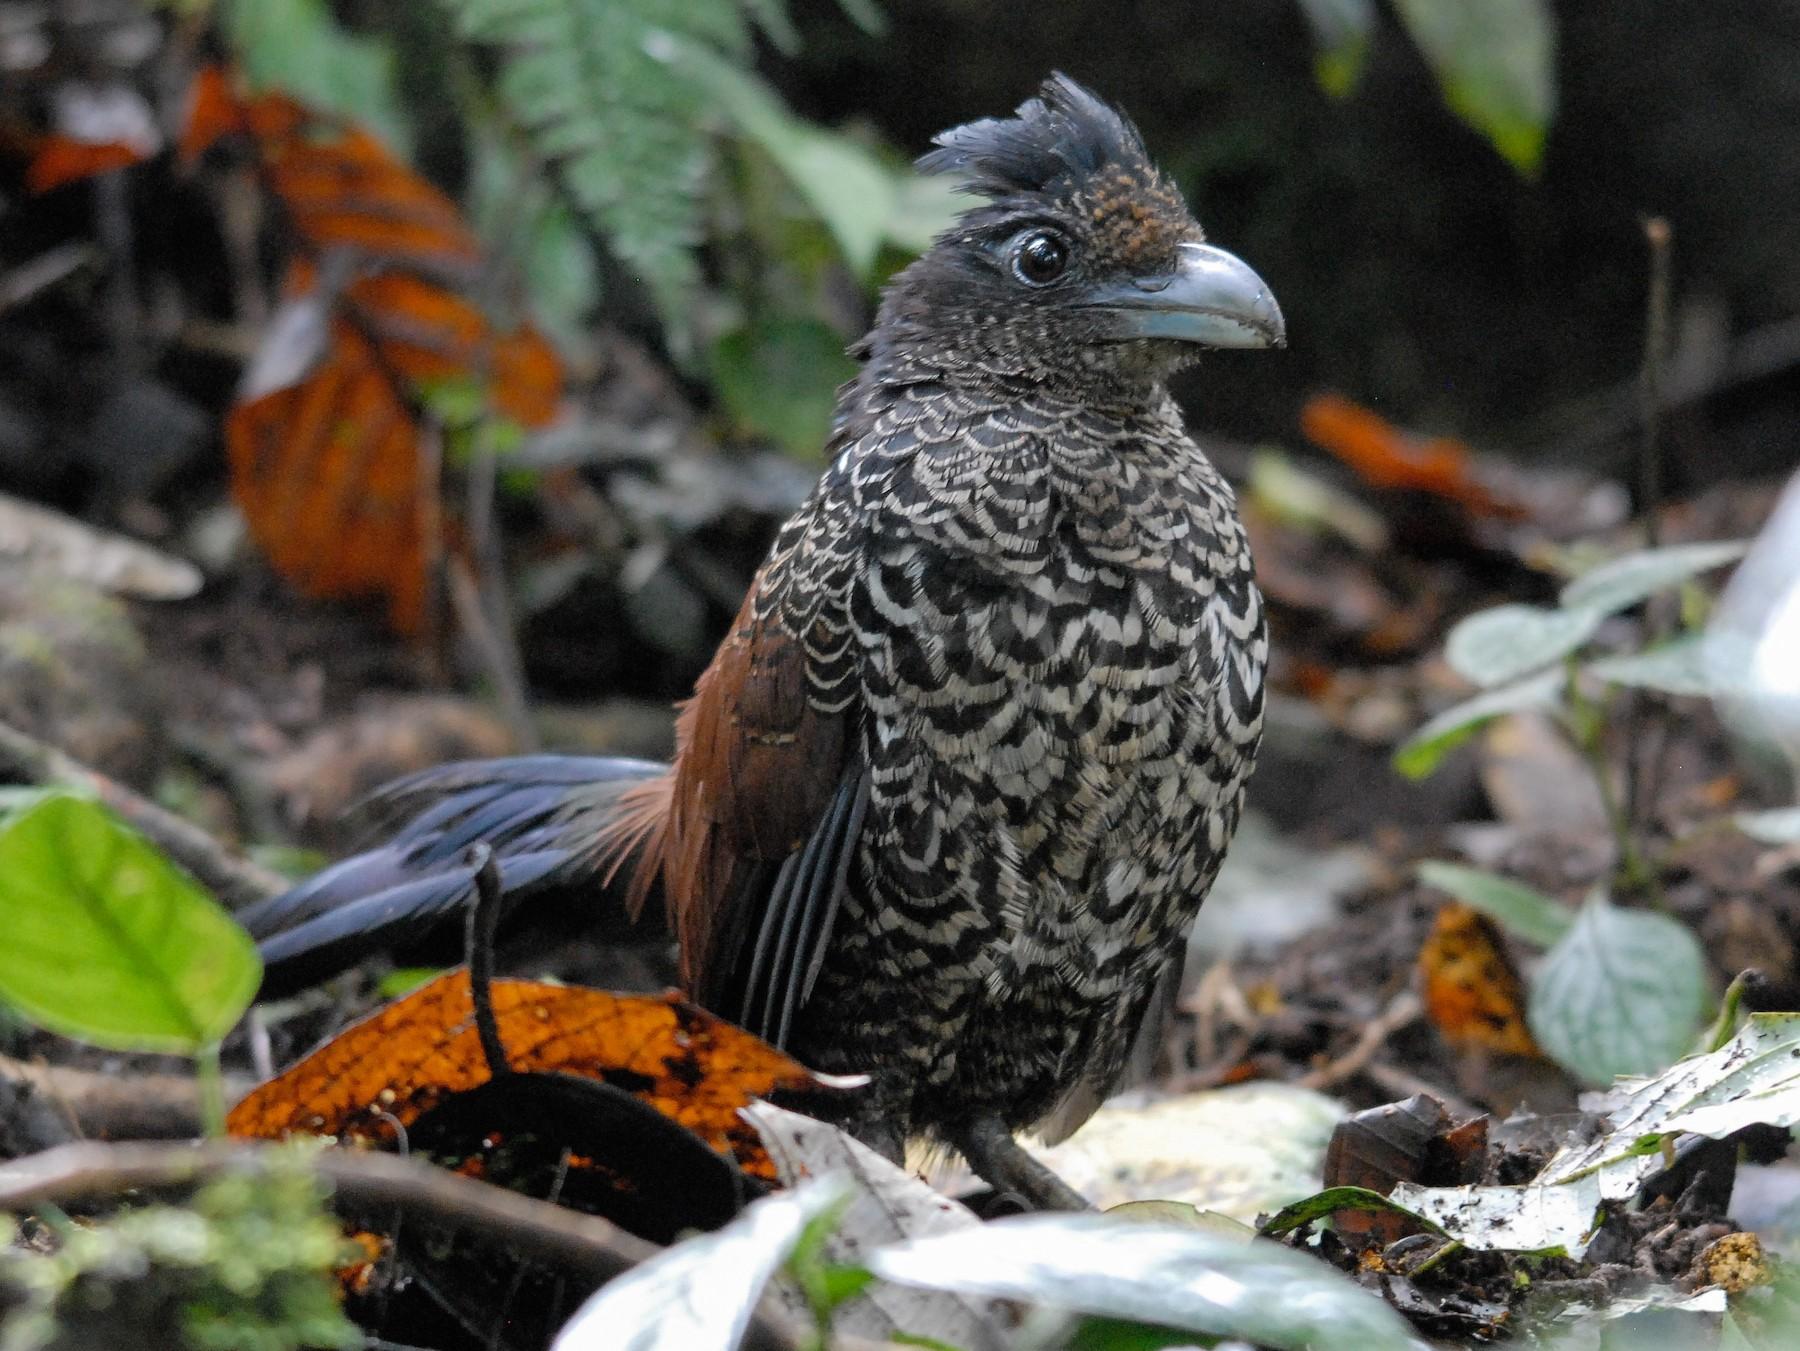 Banded Ground-Cuckoo - Markus Craig